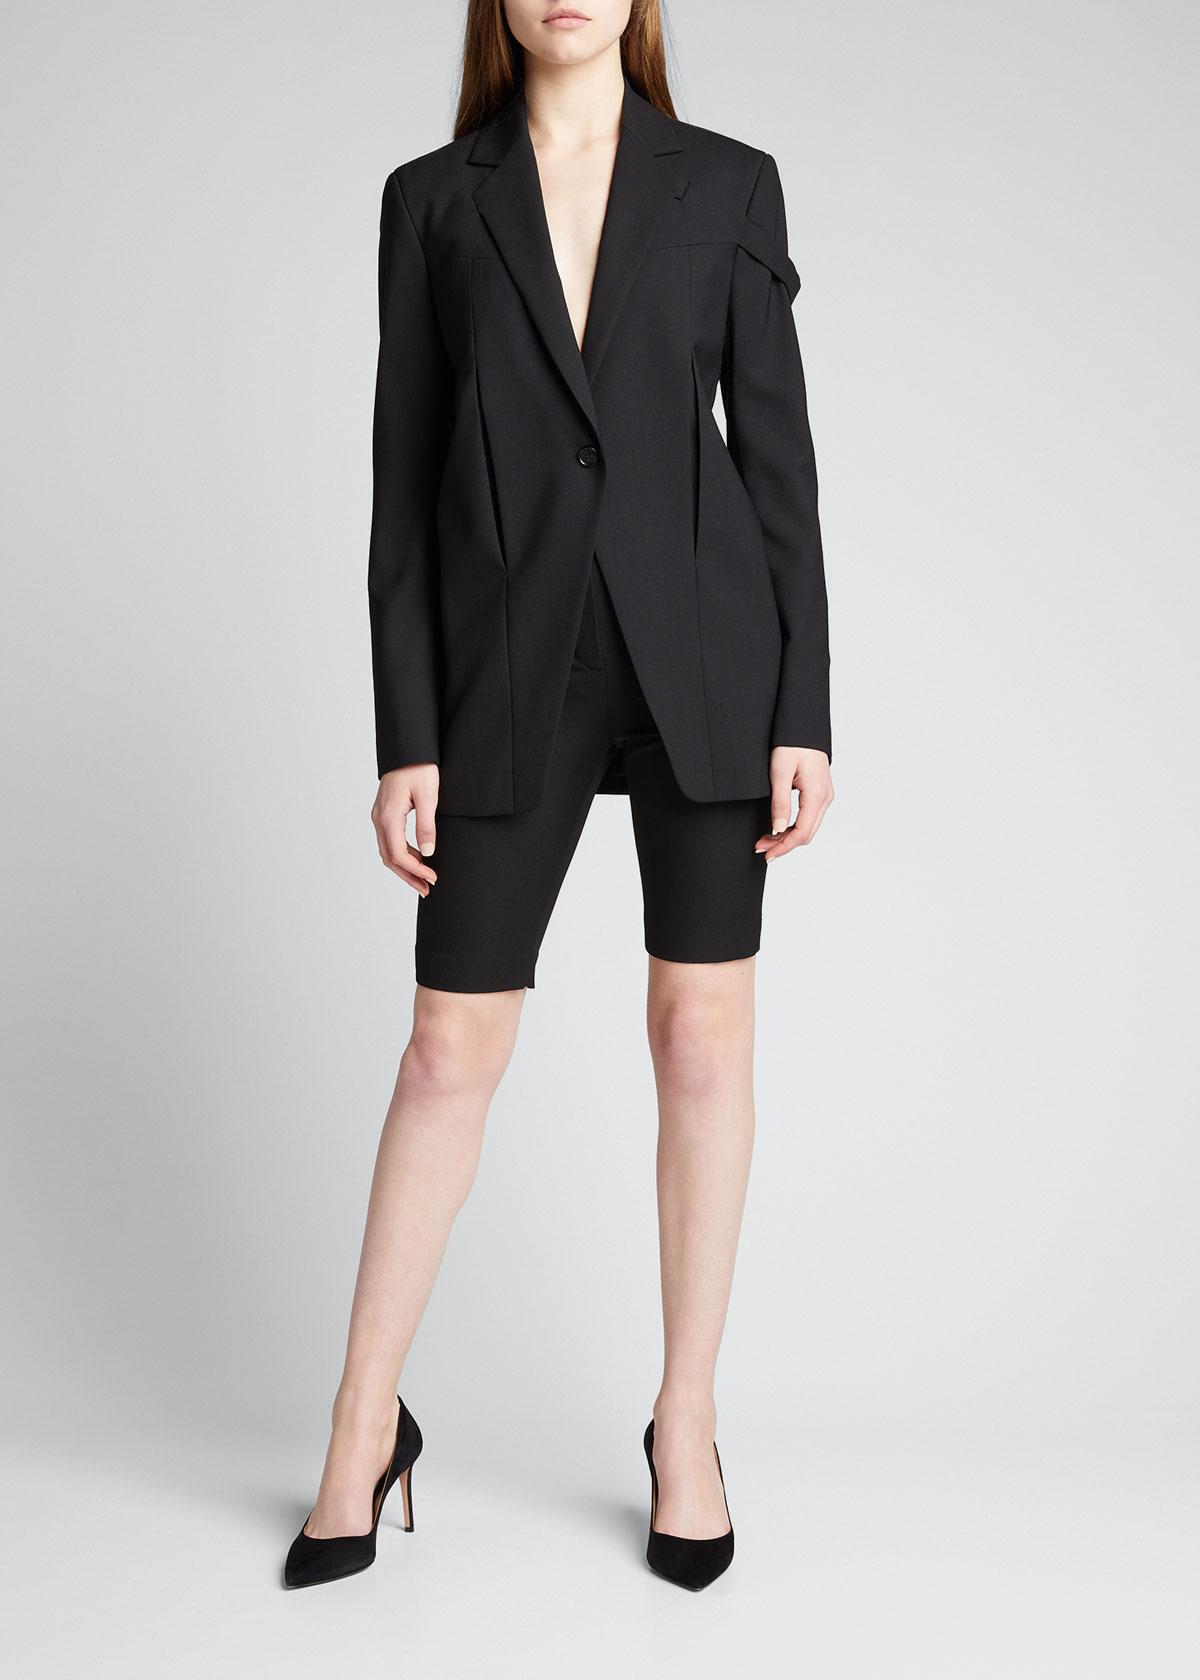 Balmain High-Rise Wool Bike Shorts  - female - BLACK - Size: 42 FR (10 US)